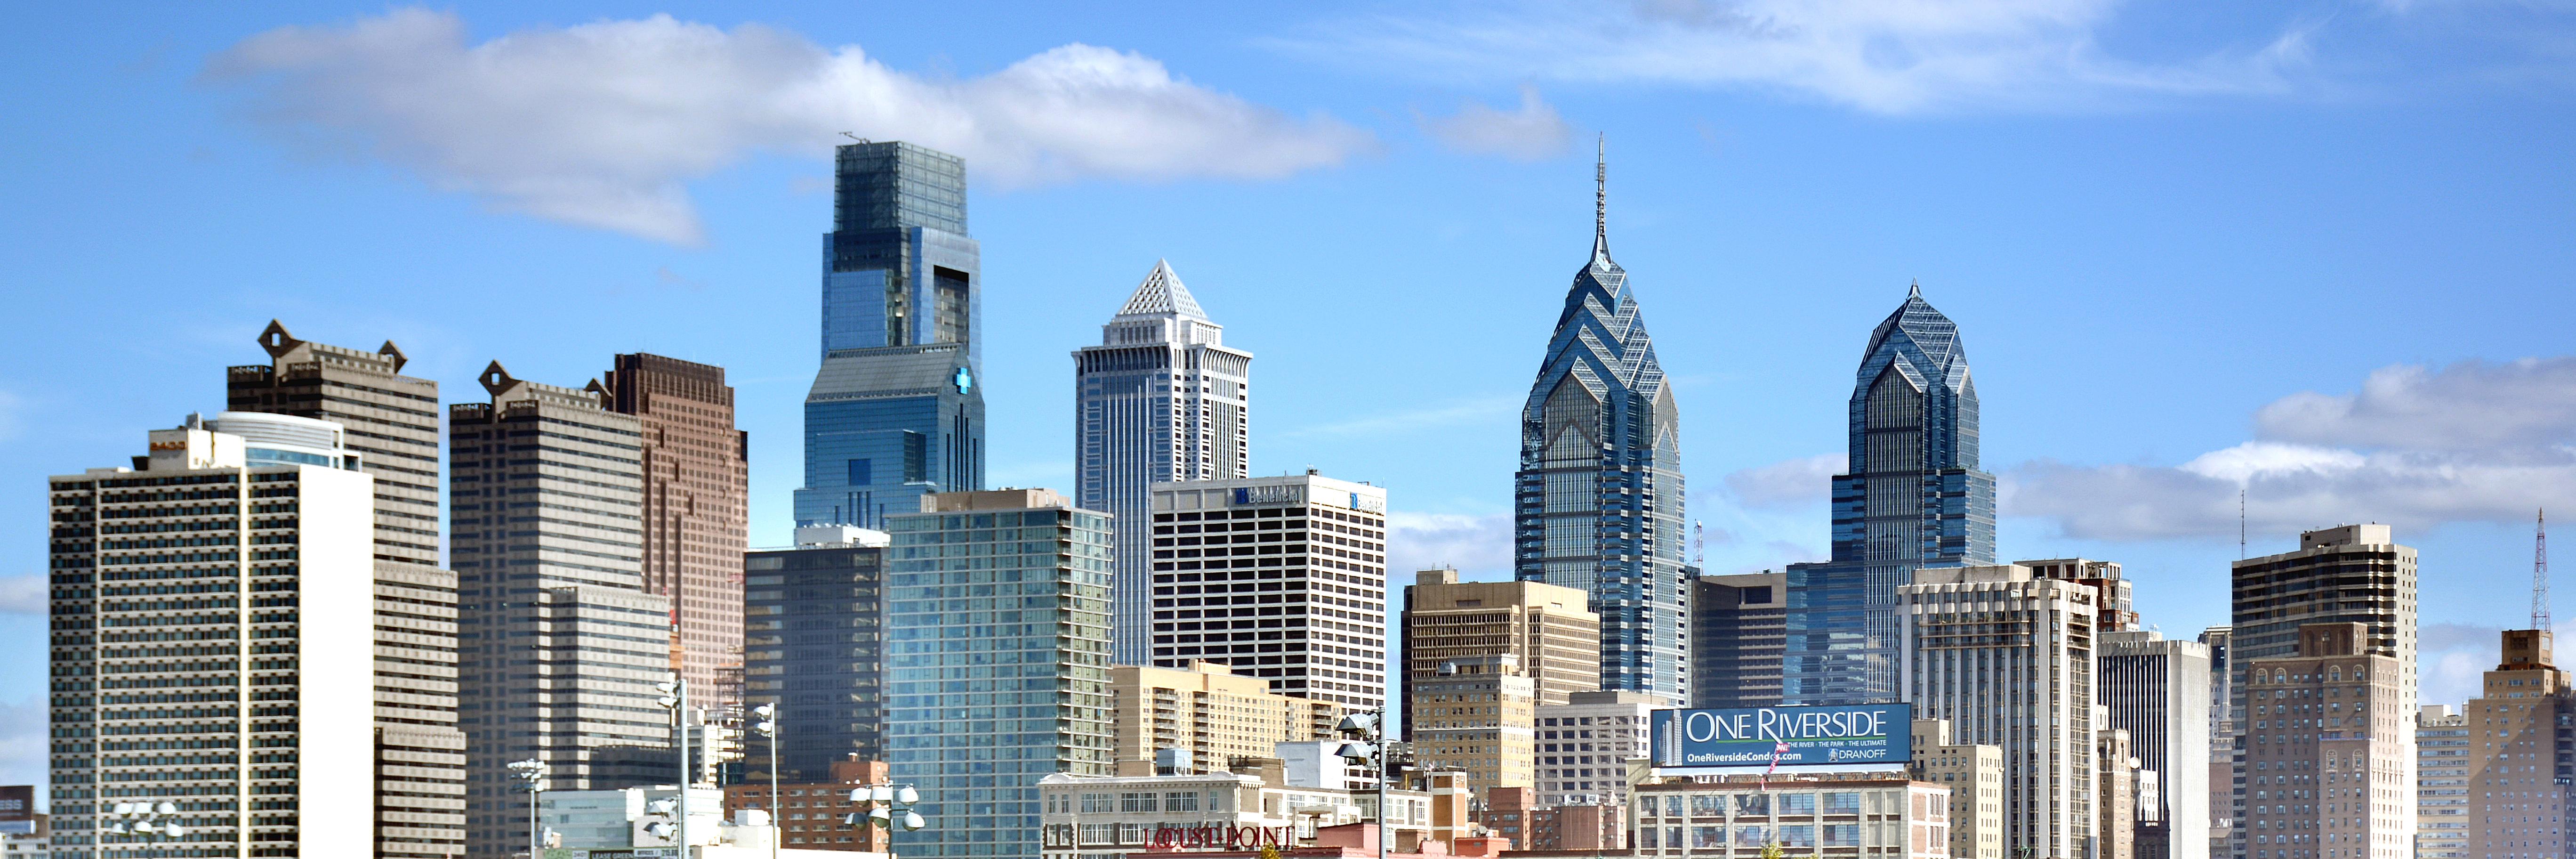 Philadelphia_skyline_from_the_southwest_2015